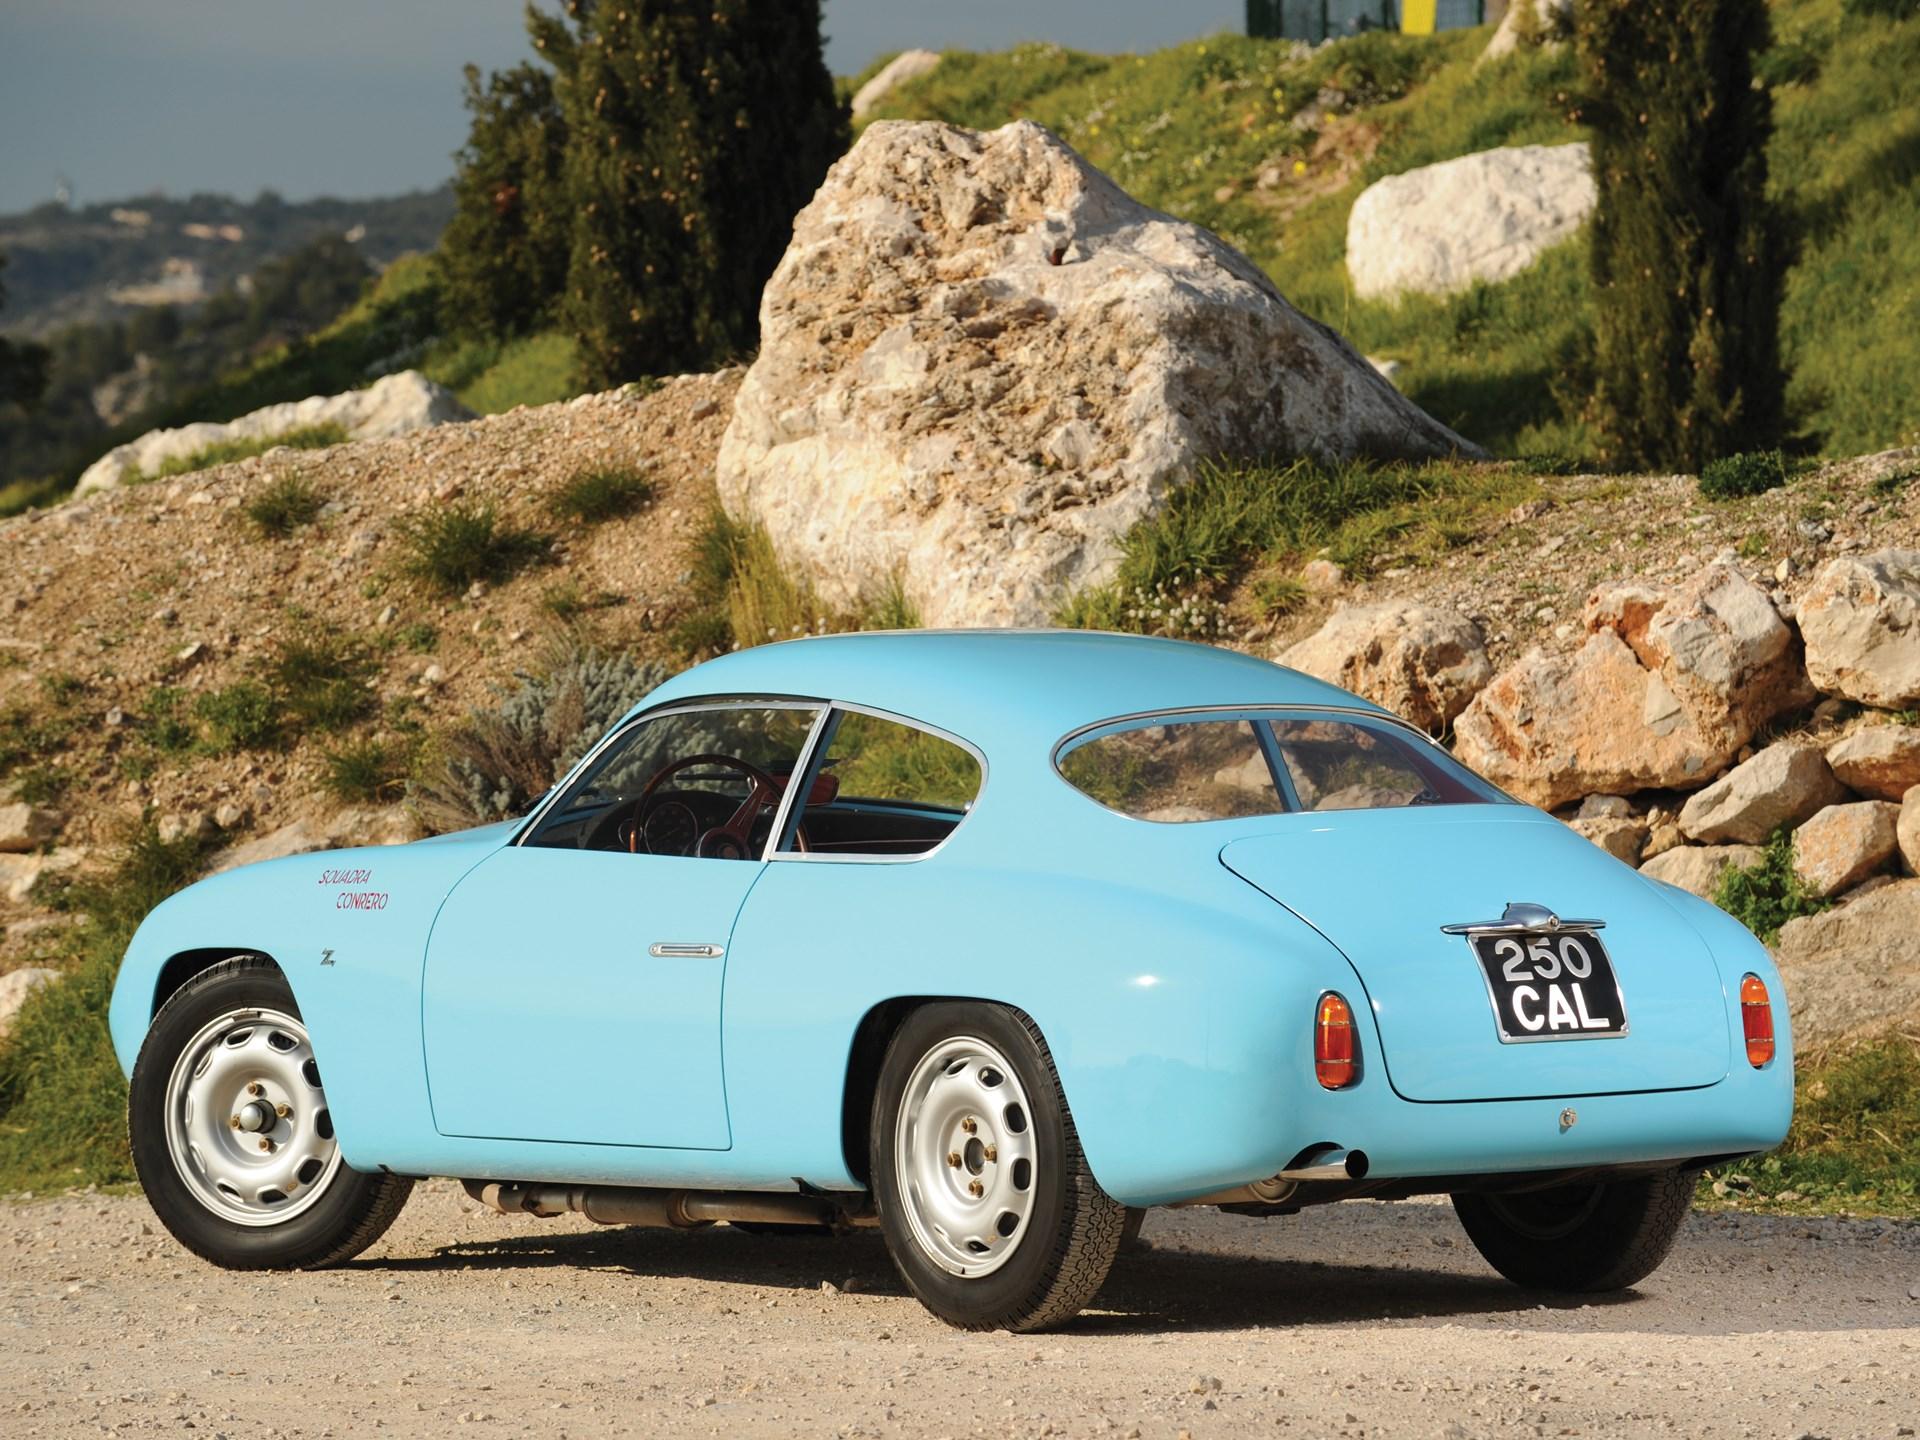 Alfa Romeo Giulietta Sprint Zagato 1958 rmsotheby\\\'s com 134d516affed705fc5f70951d9bfb652280f60c6